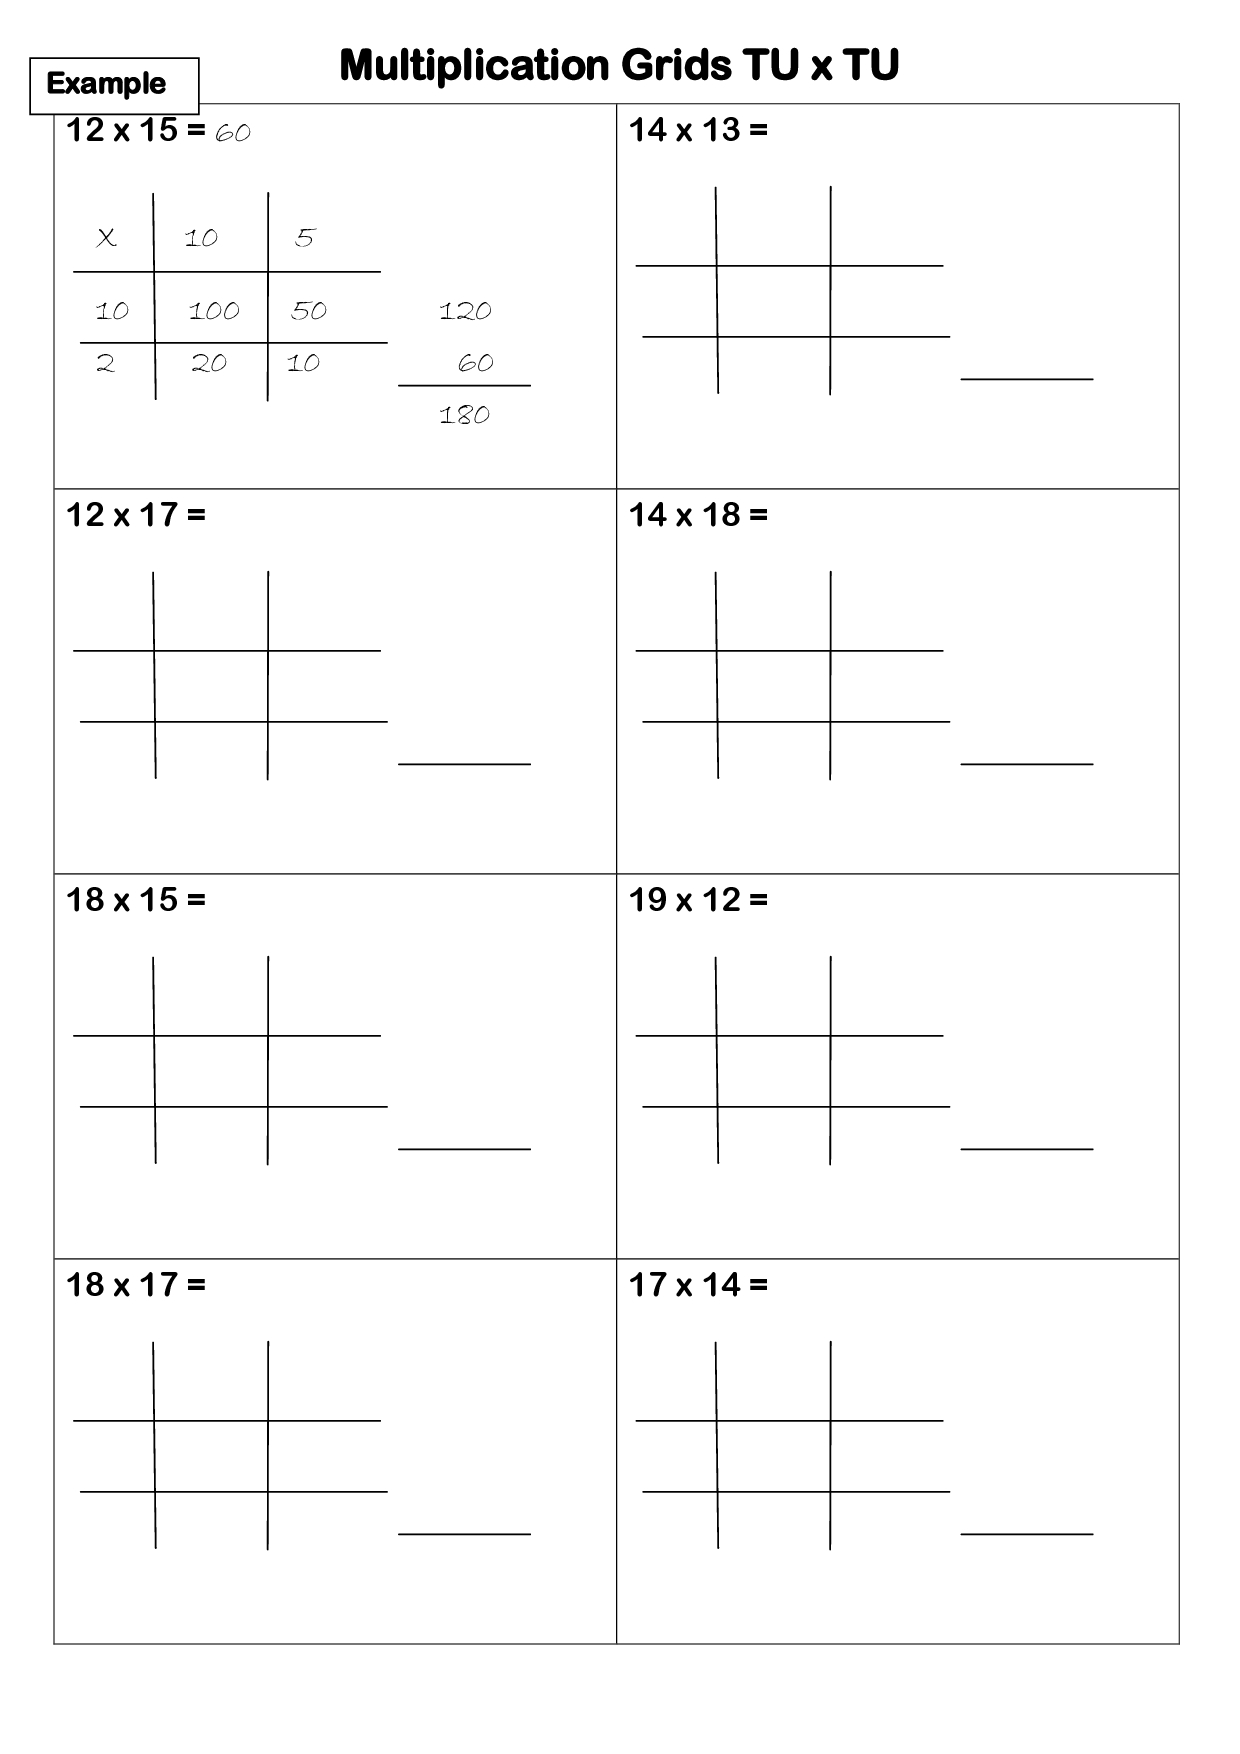 Worksheet Works Lattice | Printable Worksheets And in Printable Lattice Multiplication Grids